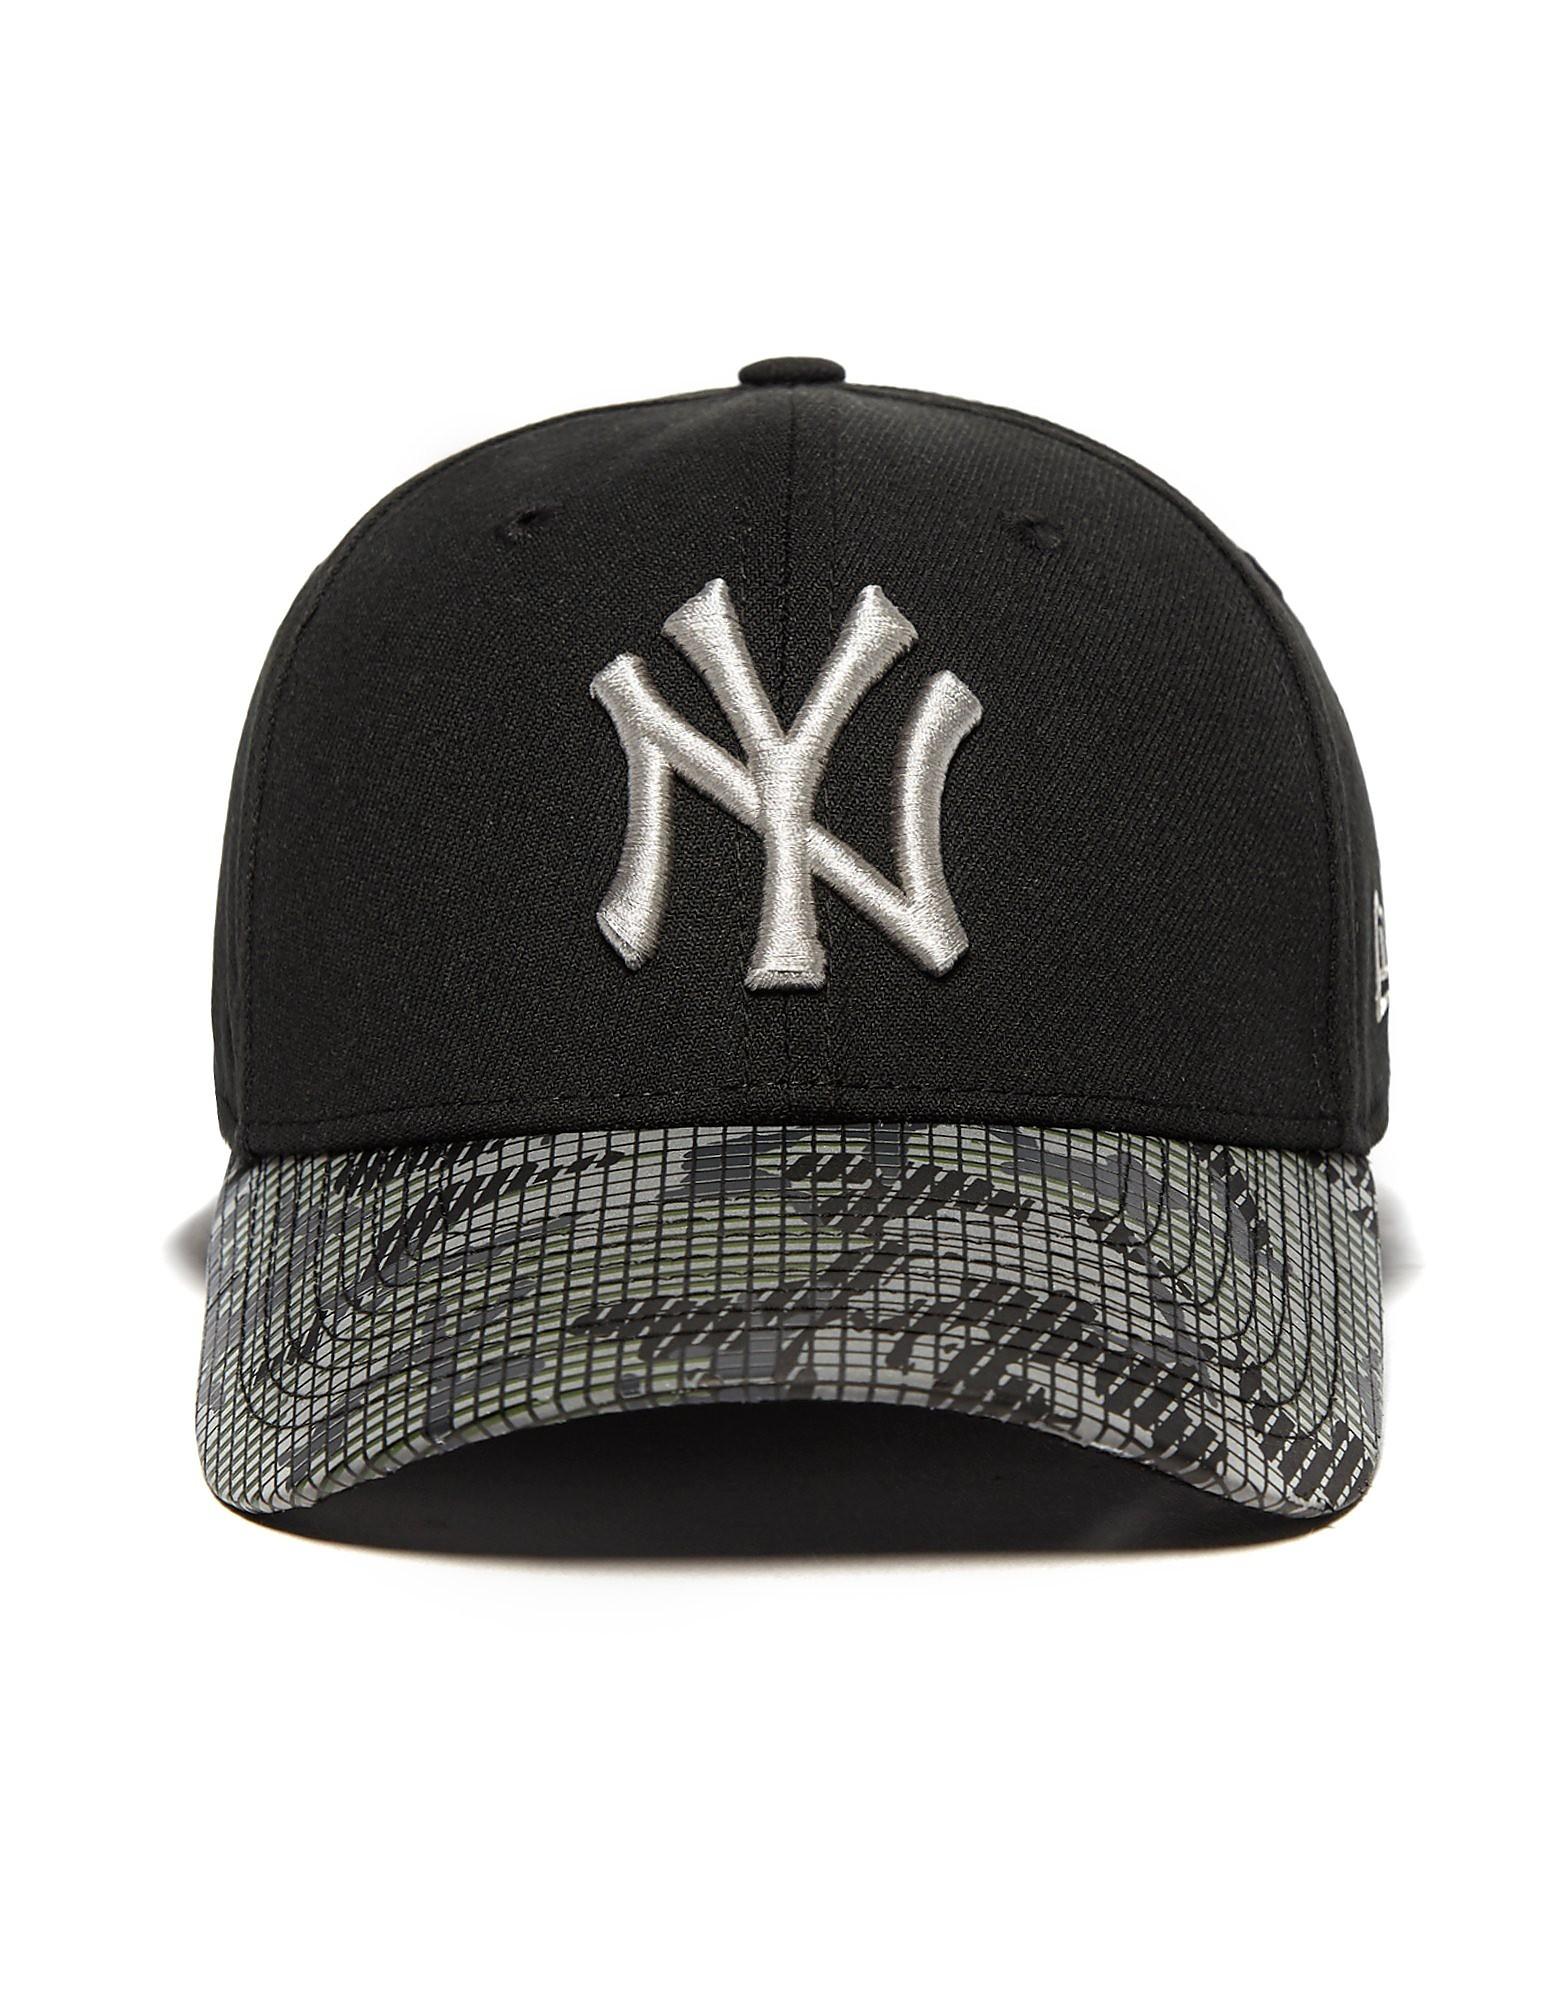 New Era MLB New York Yankees Reflect Cap